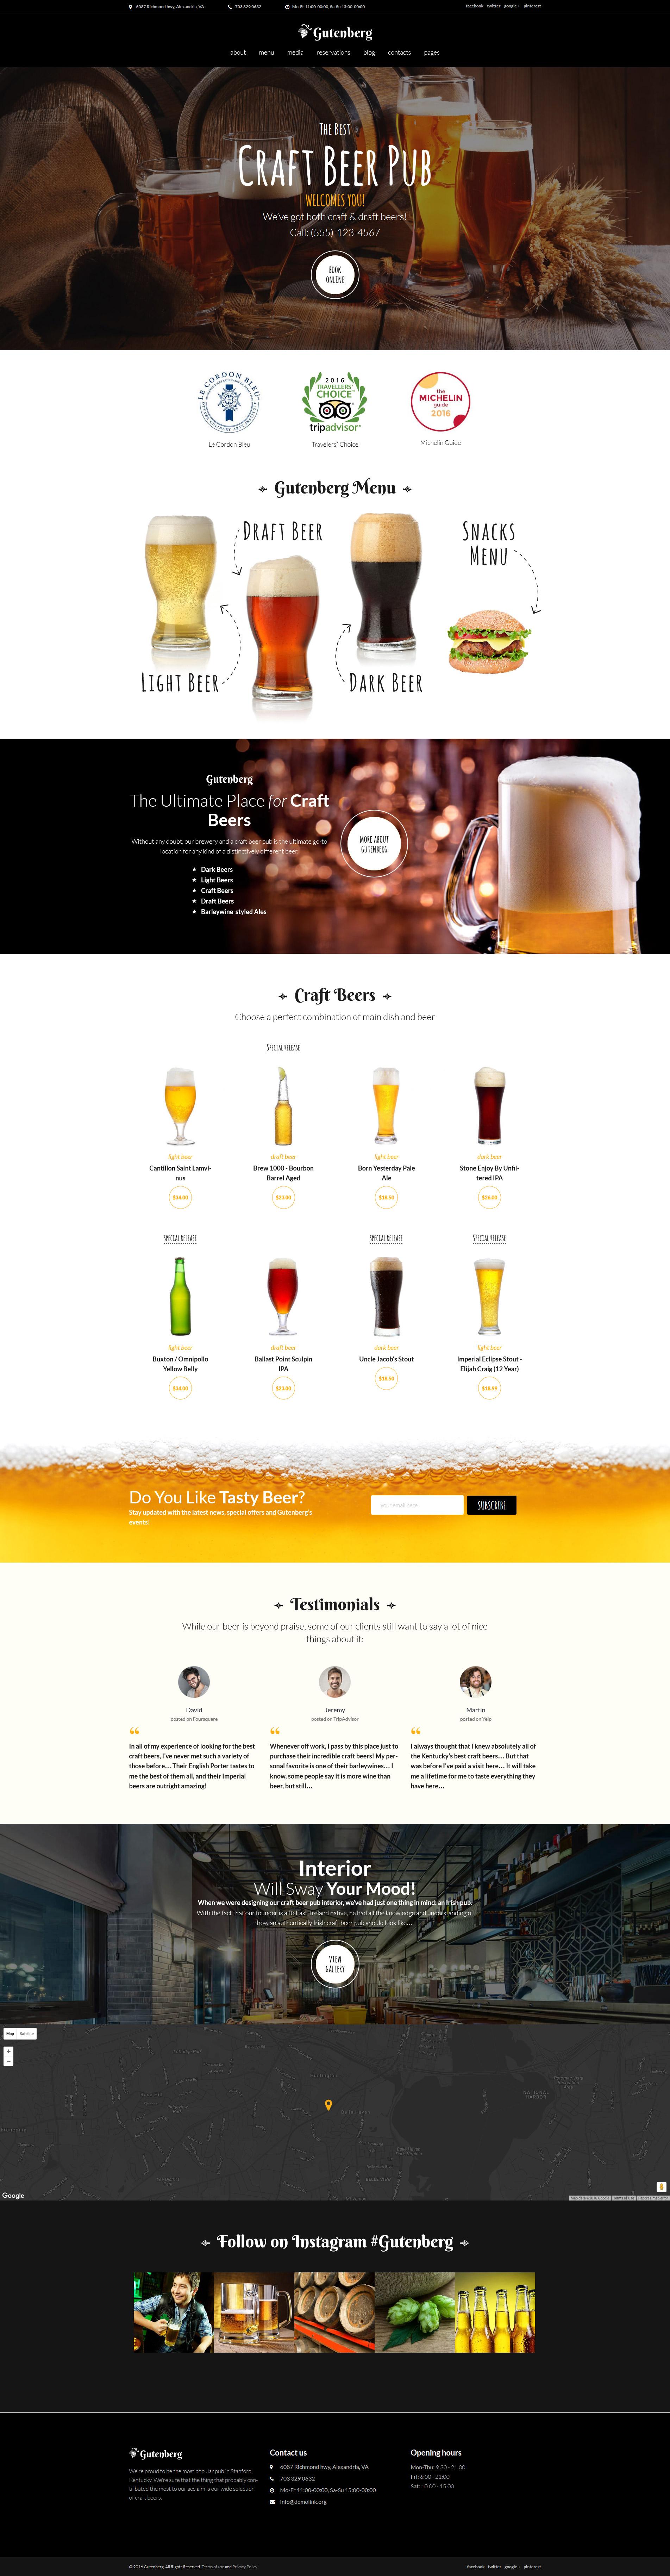 GutenBerg - Beer Pub and Brewery WordPress-tema #59005